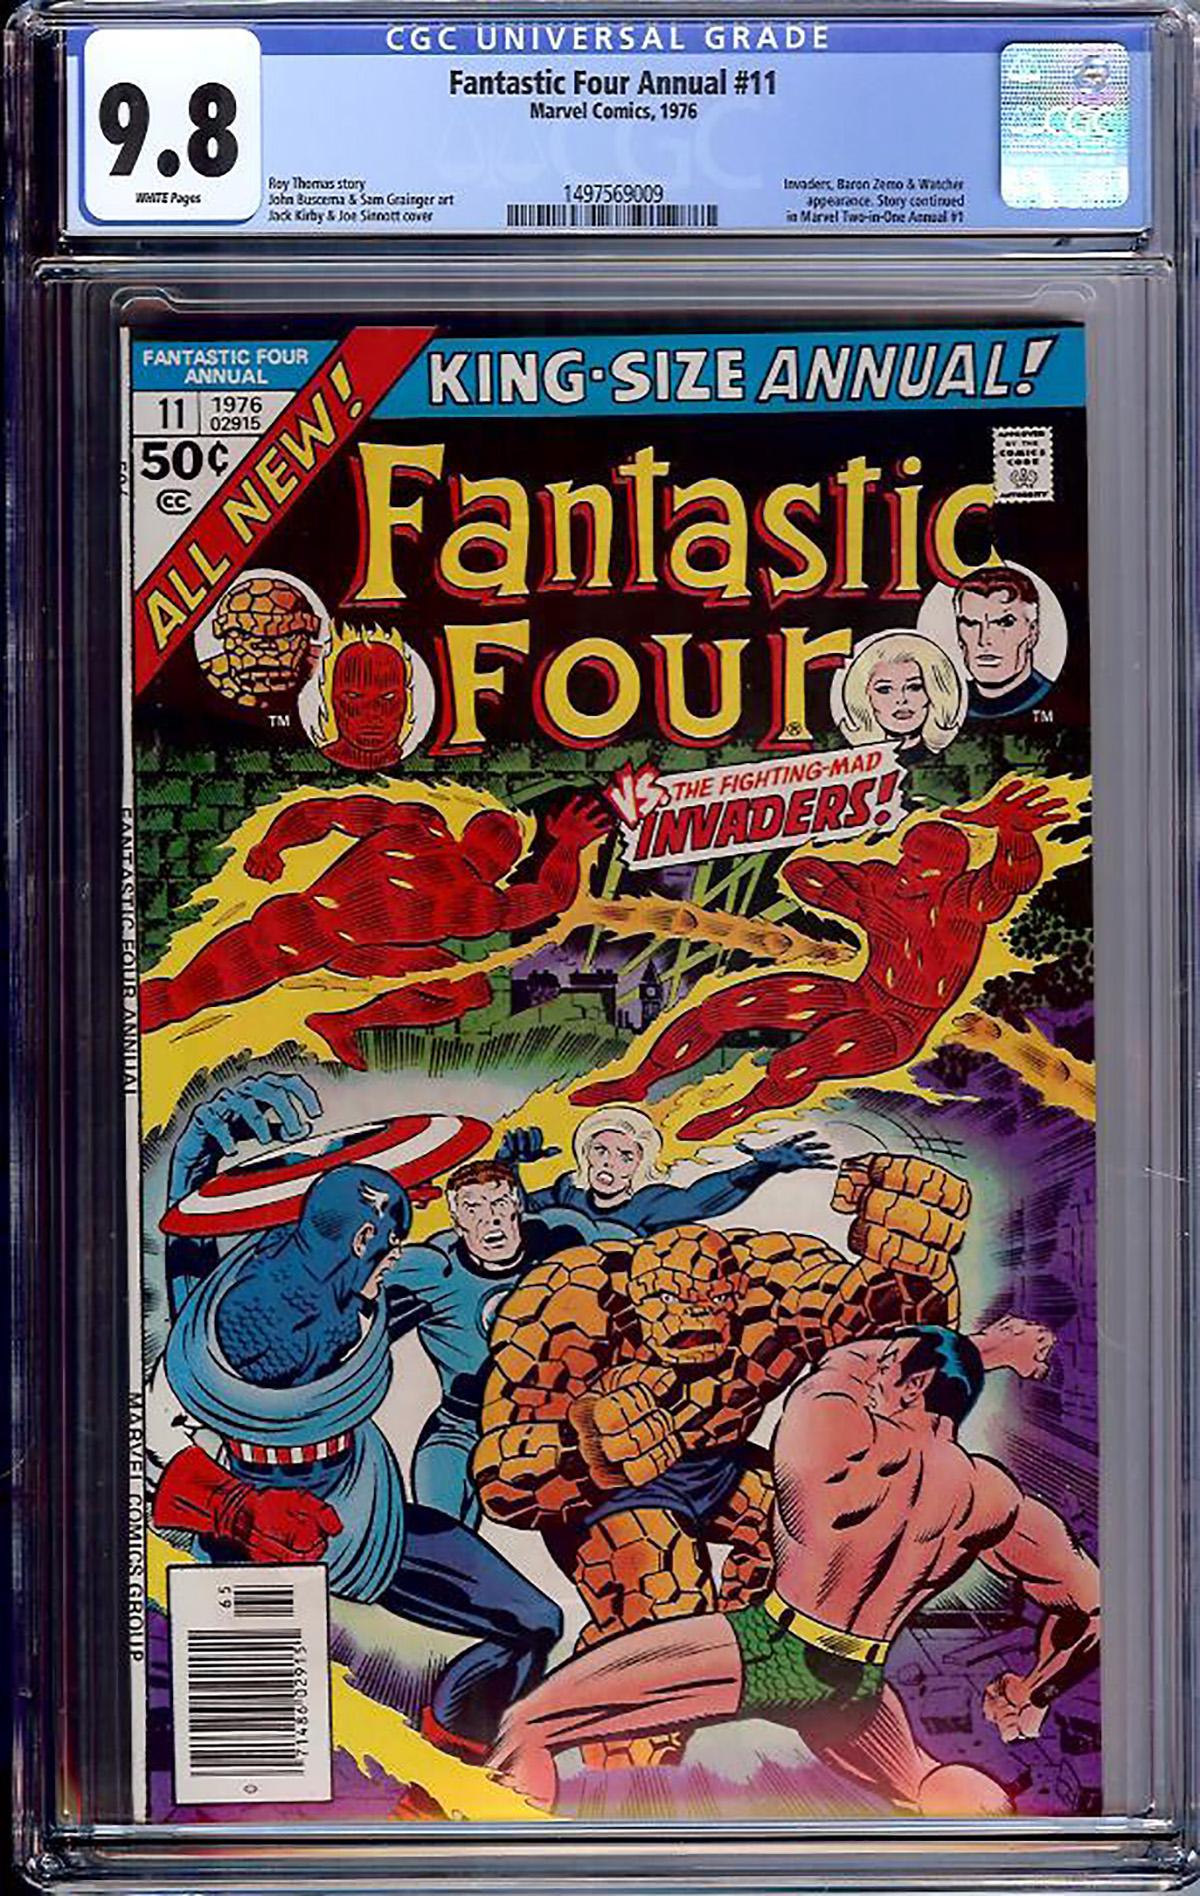 Fantastic Four Annual #11 CGC 9.8 w